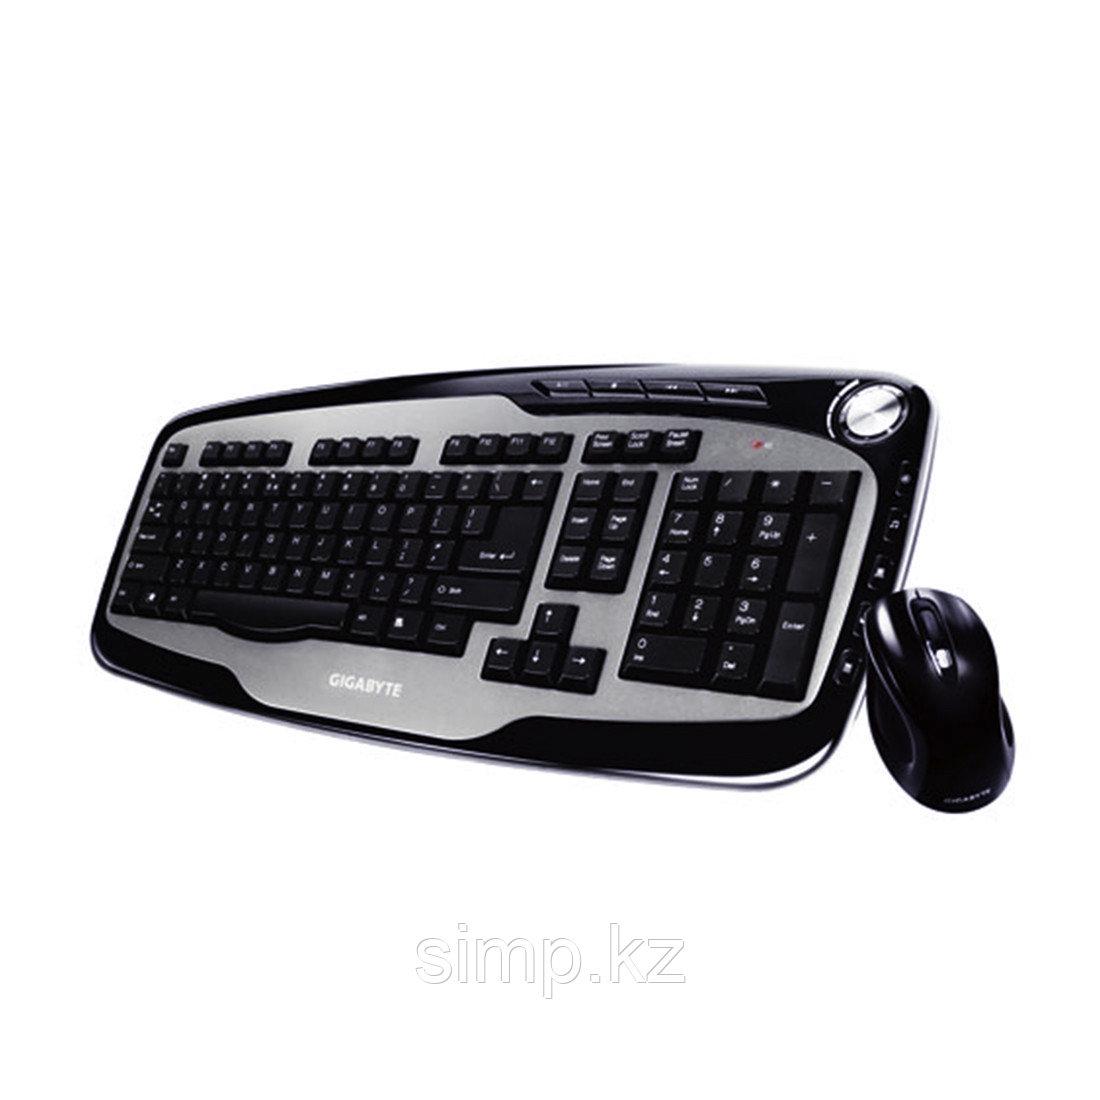 Комплект Клавиатура + Мышь Gigabyte GK-KM7600